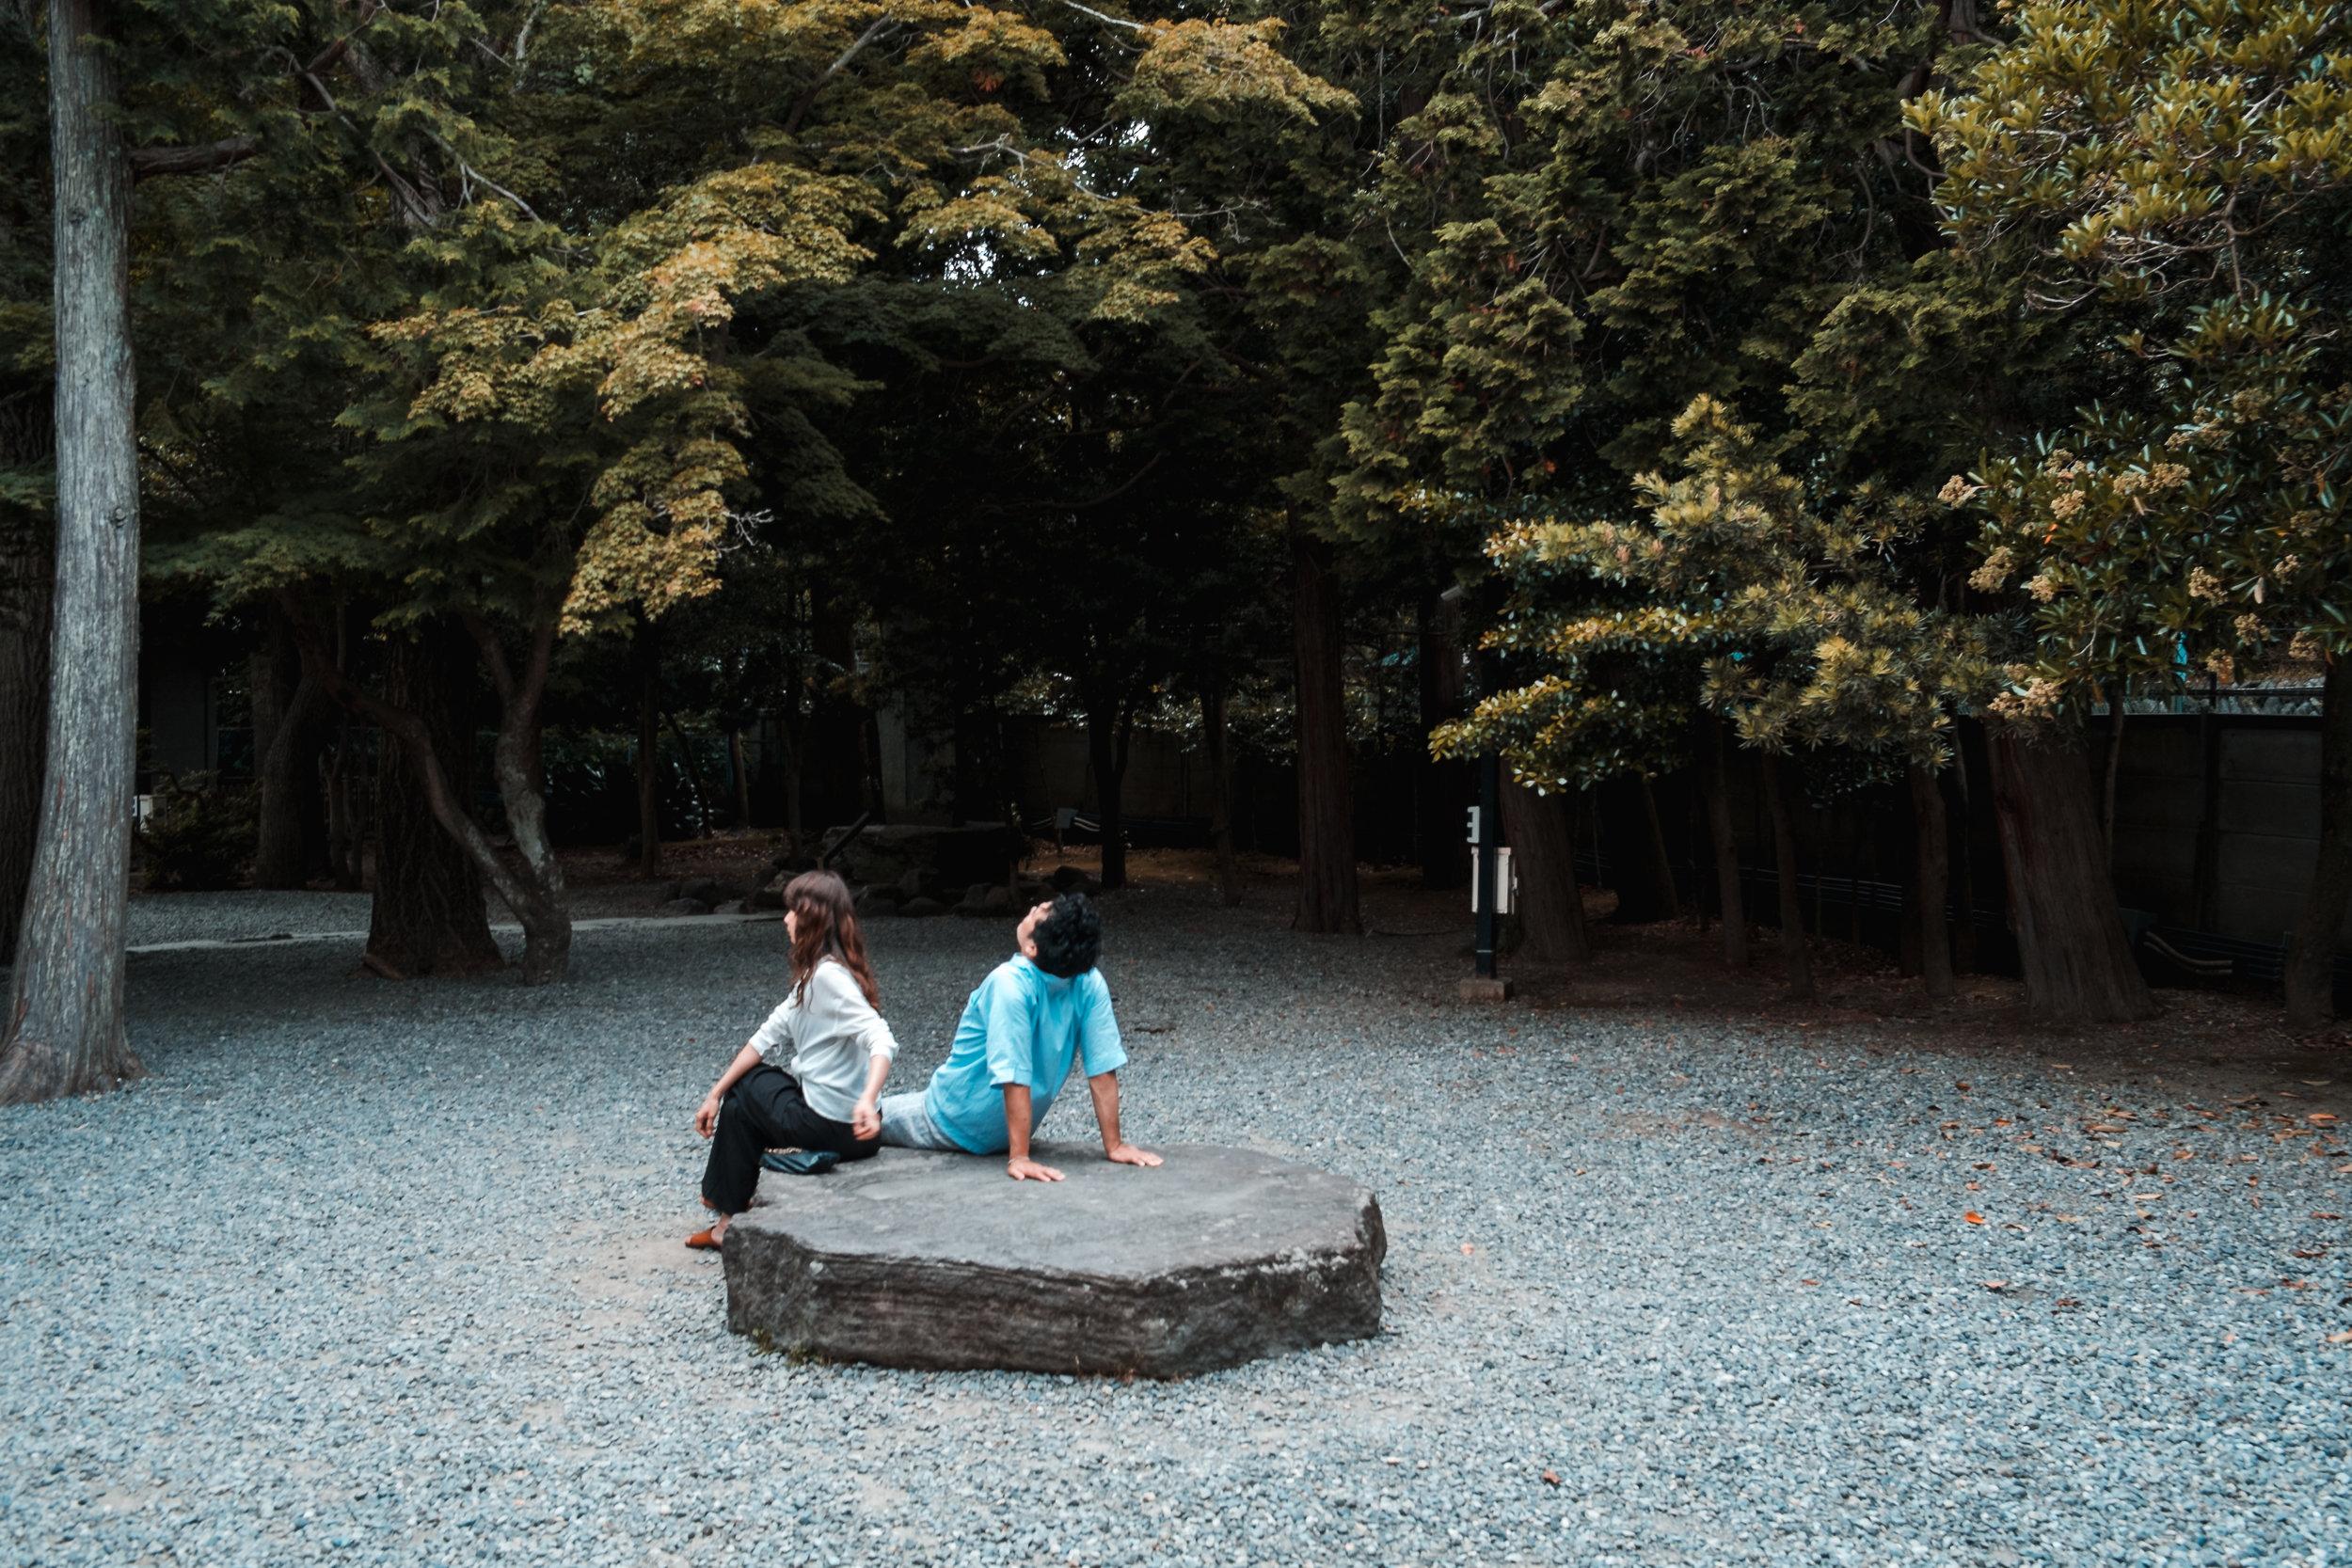 TokyoJapan_2018_AdamDillon_DSCF9556.jpg